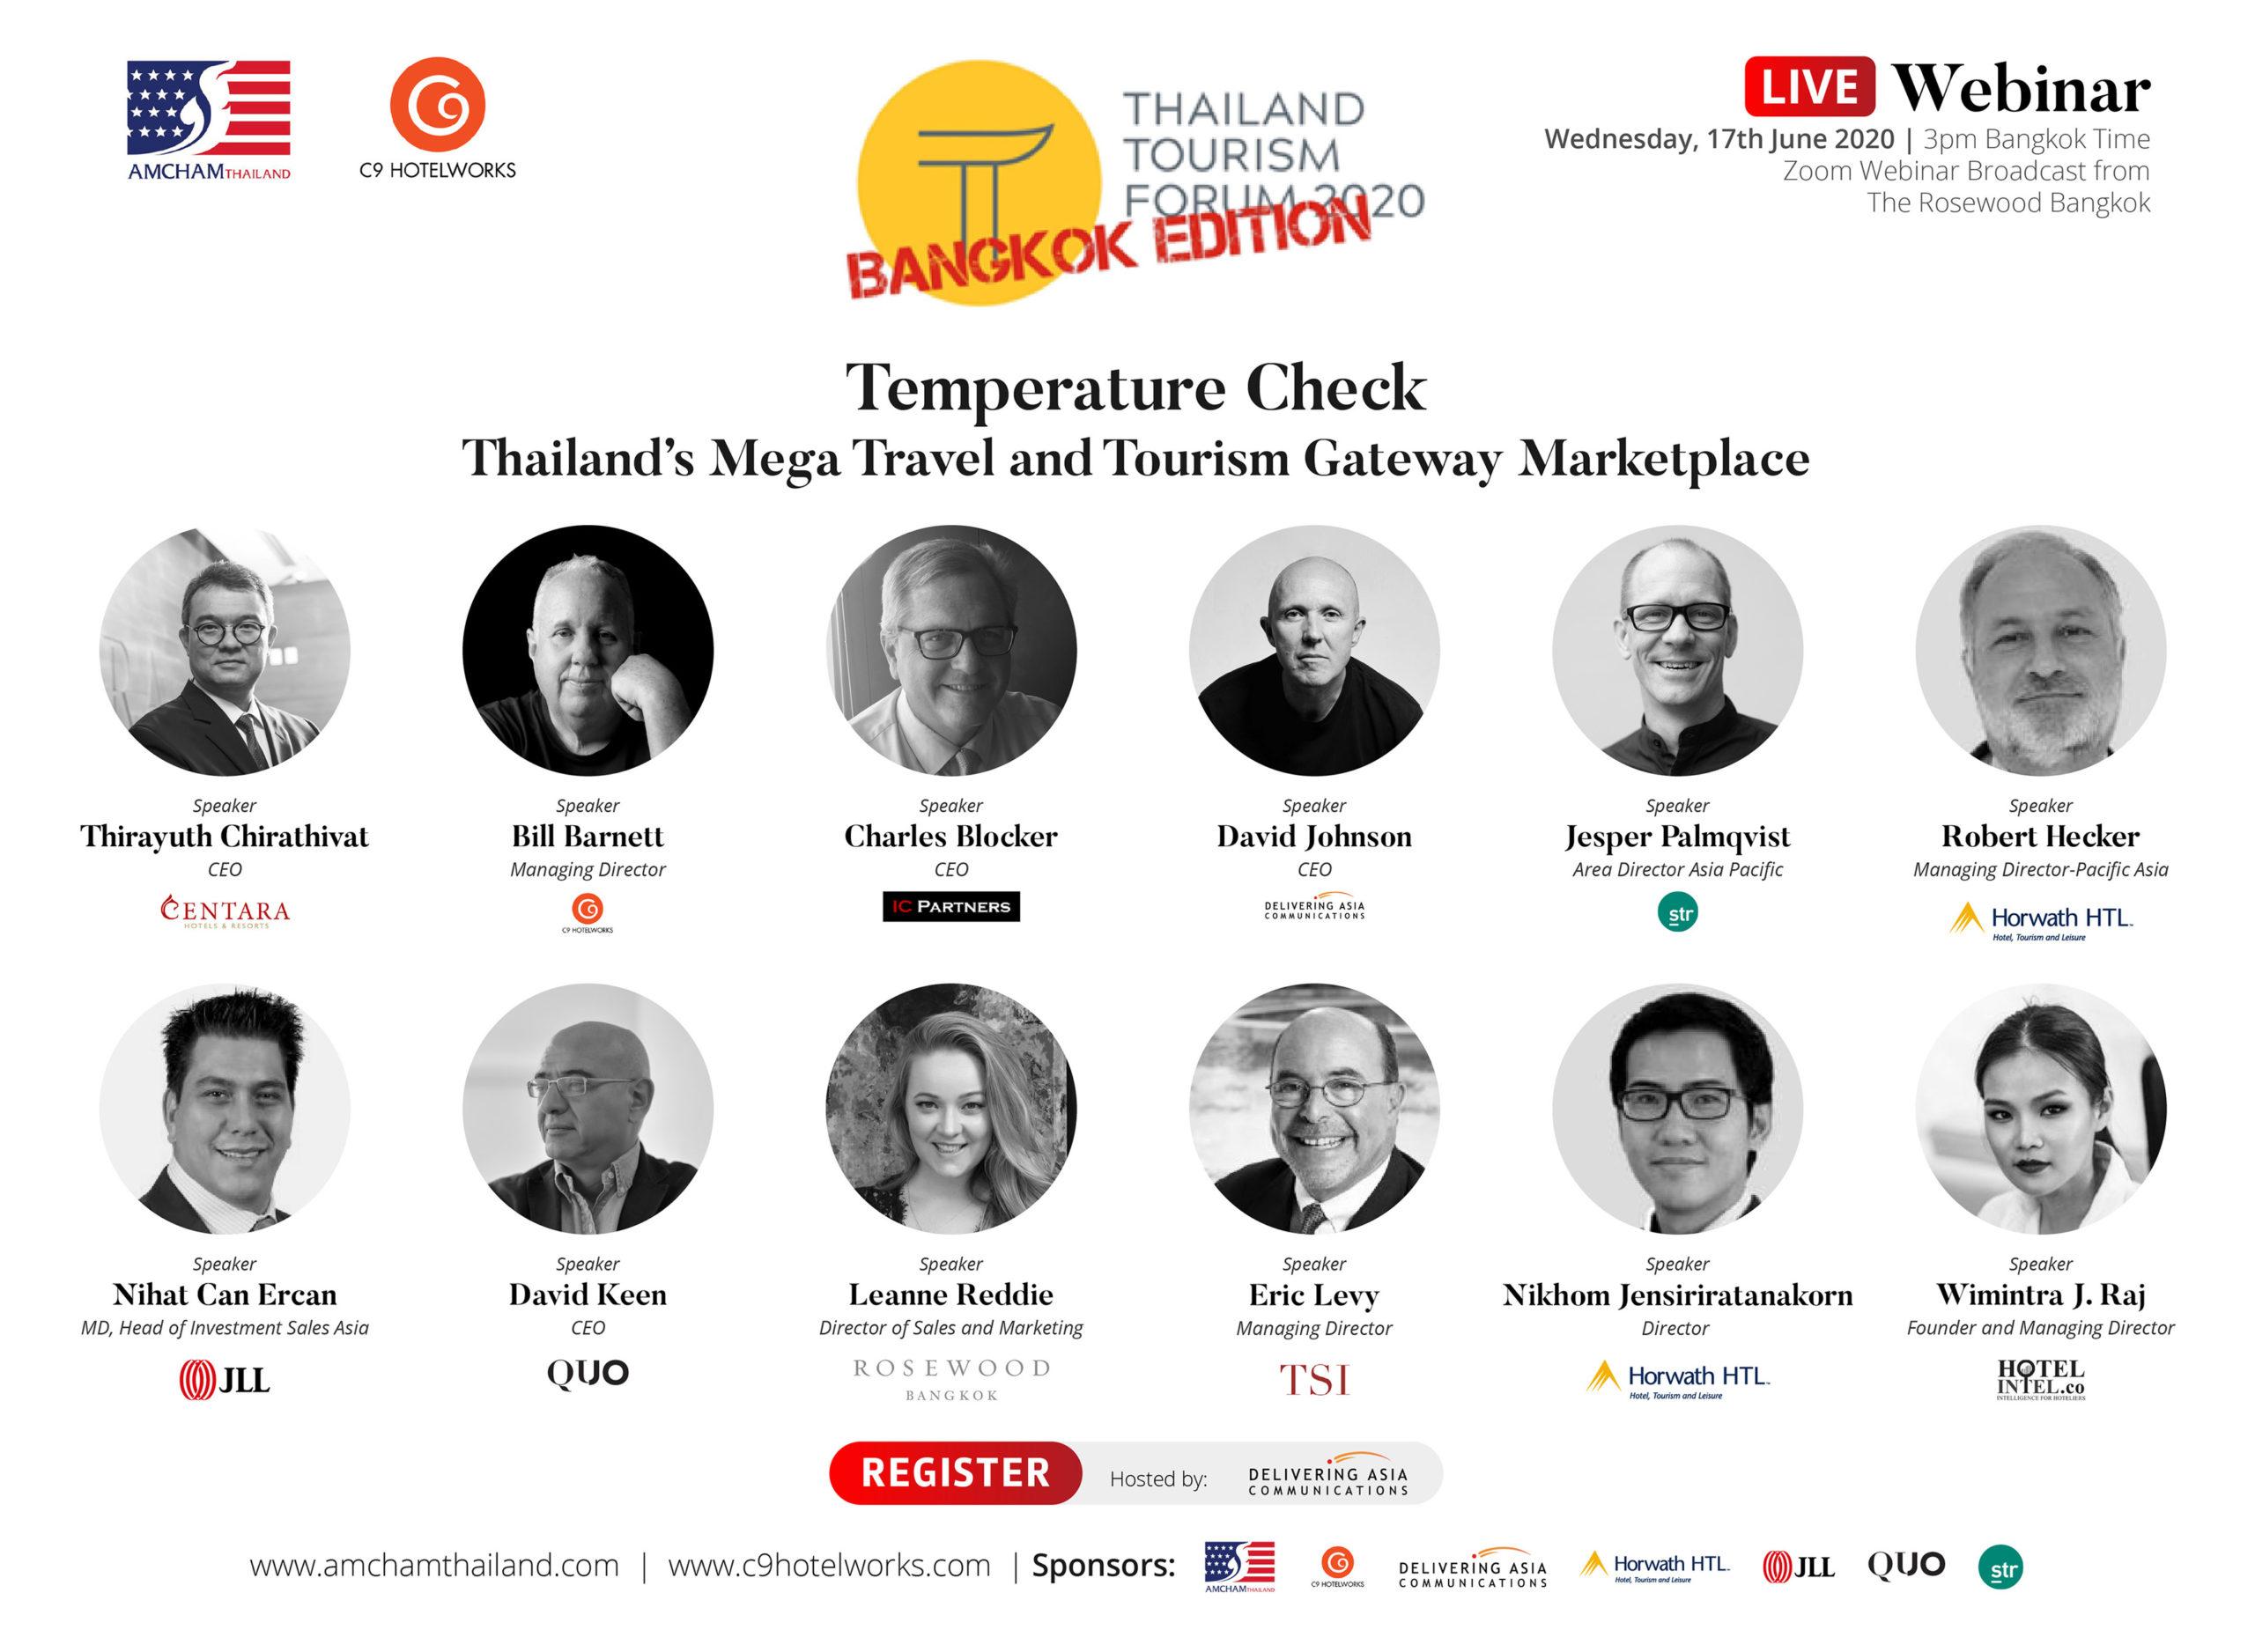 Join Horwath HTL at the Thailand Tourism Forum Webinar, Wed 17 June.